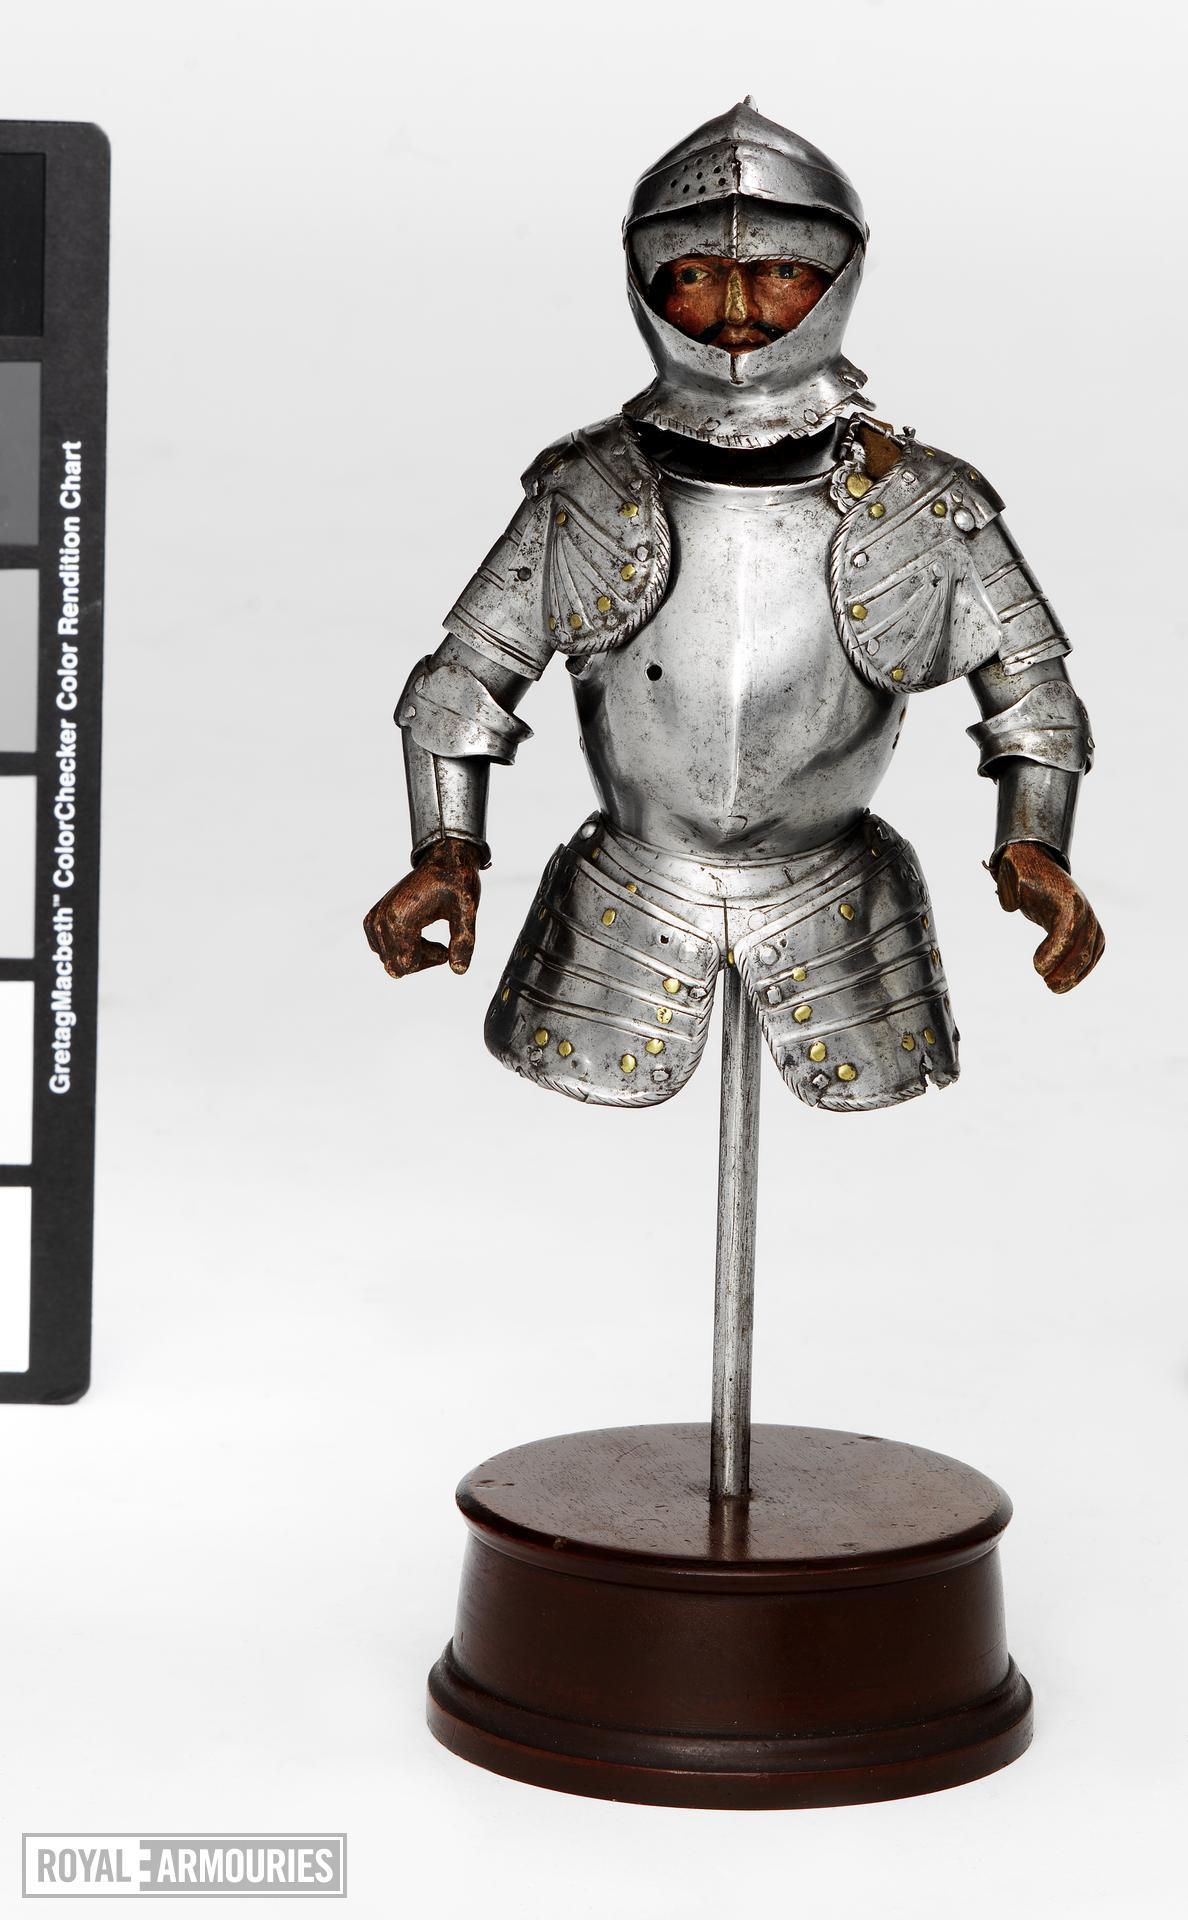 Miniature half armour Miniature half armour